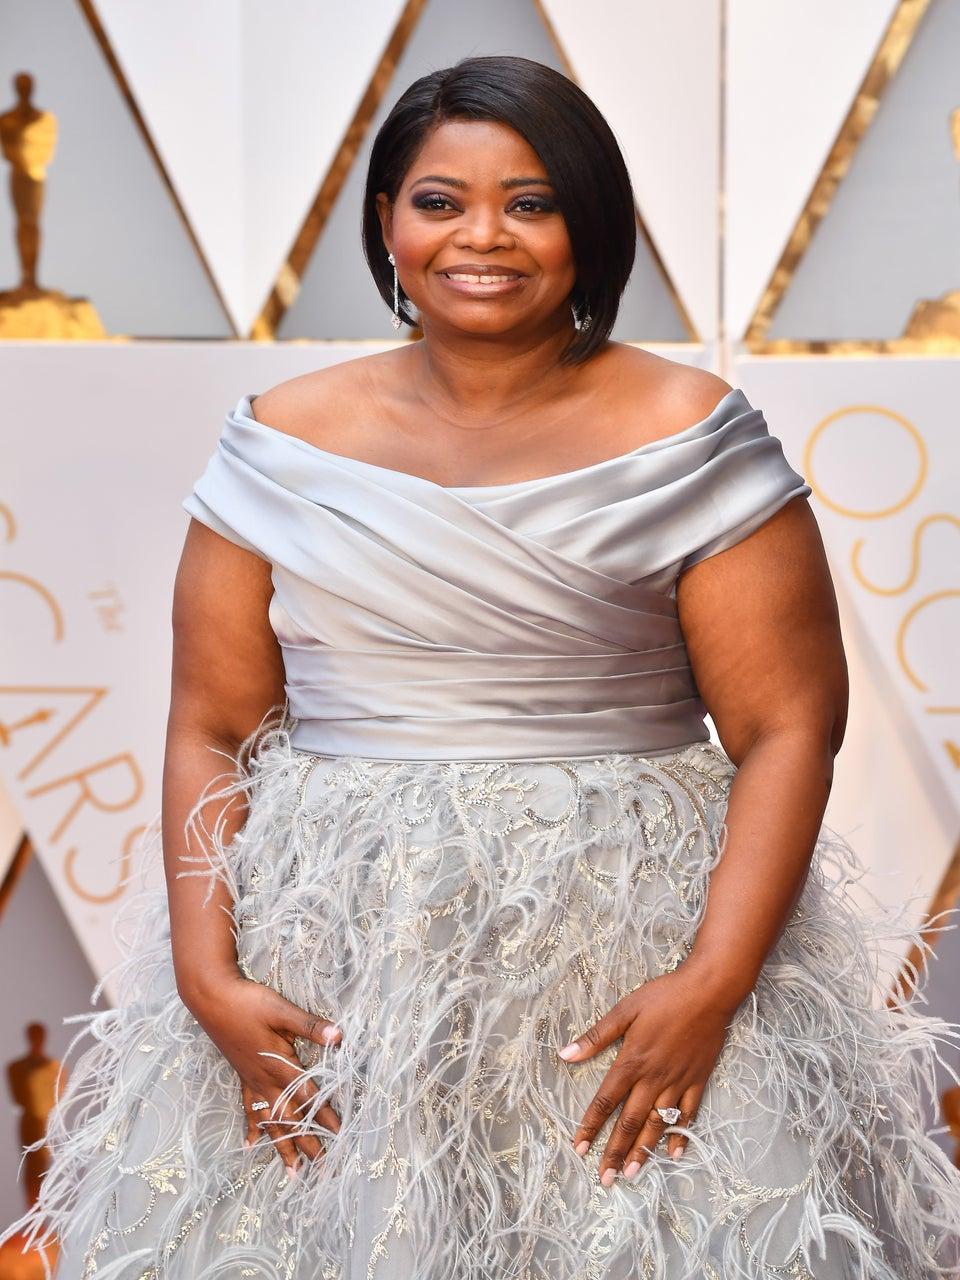 Octavia Spencer is a Silver Belle on Oscars 2017 Red Carpet